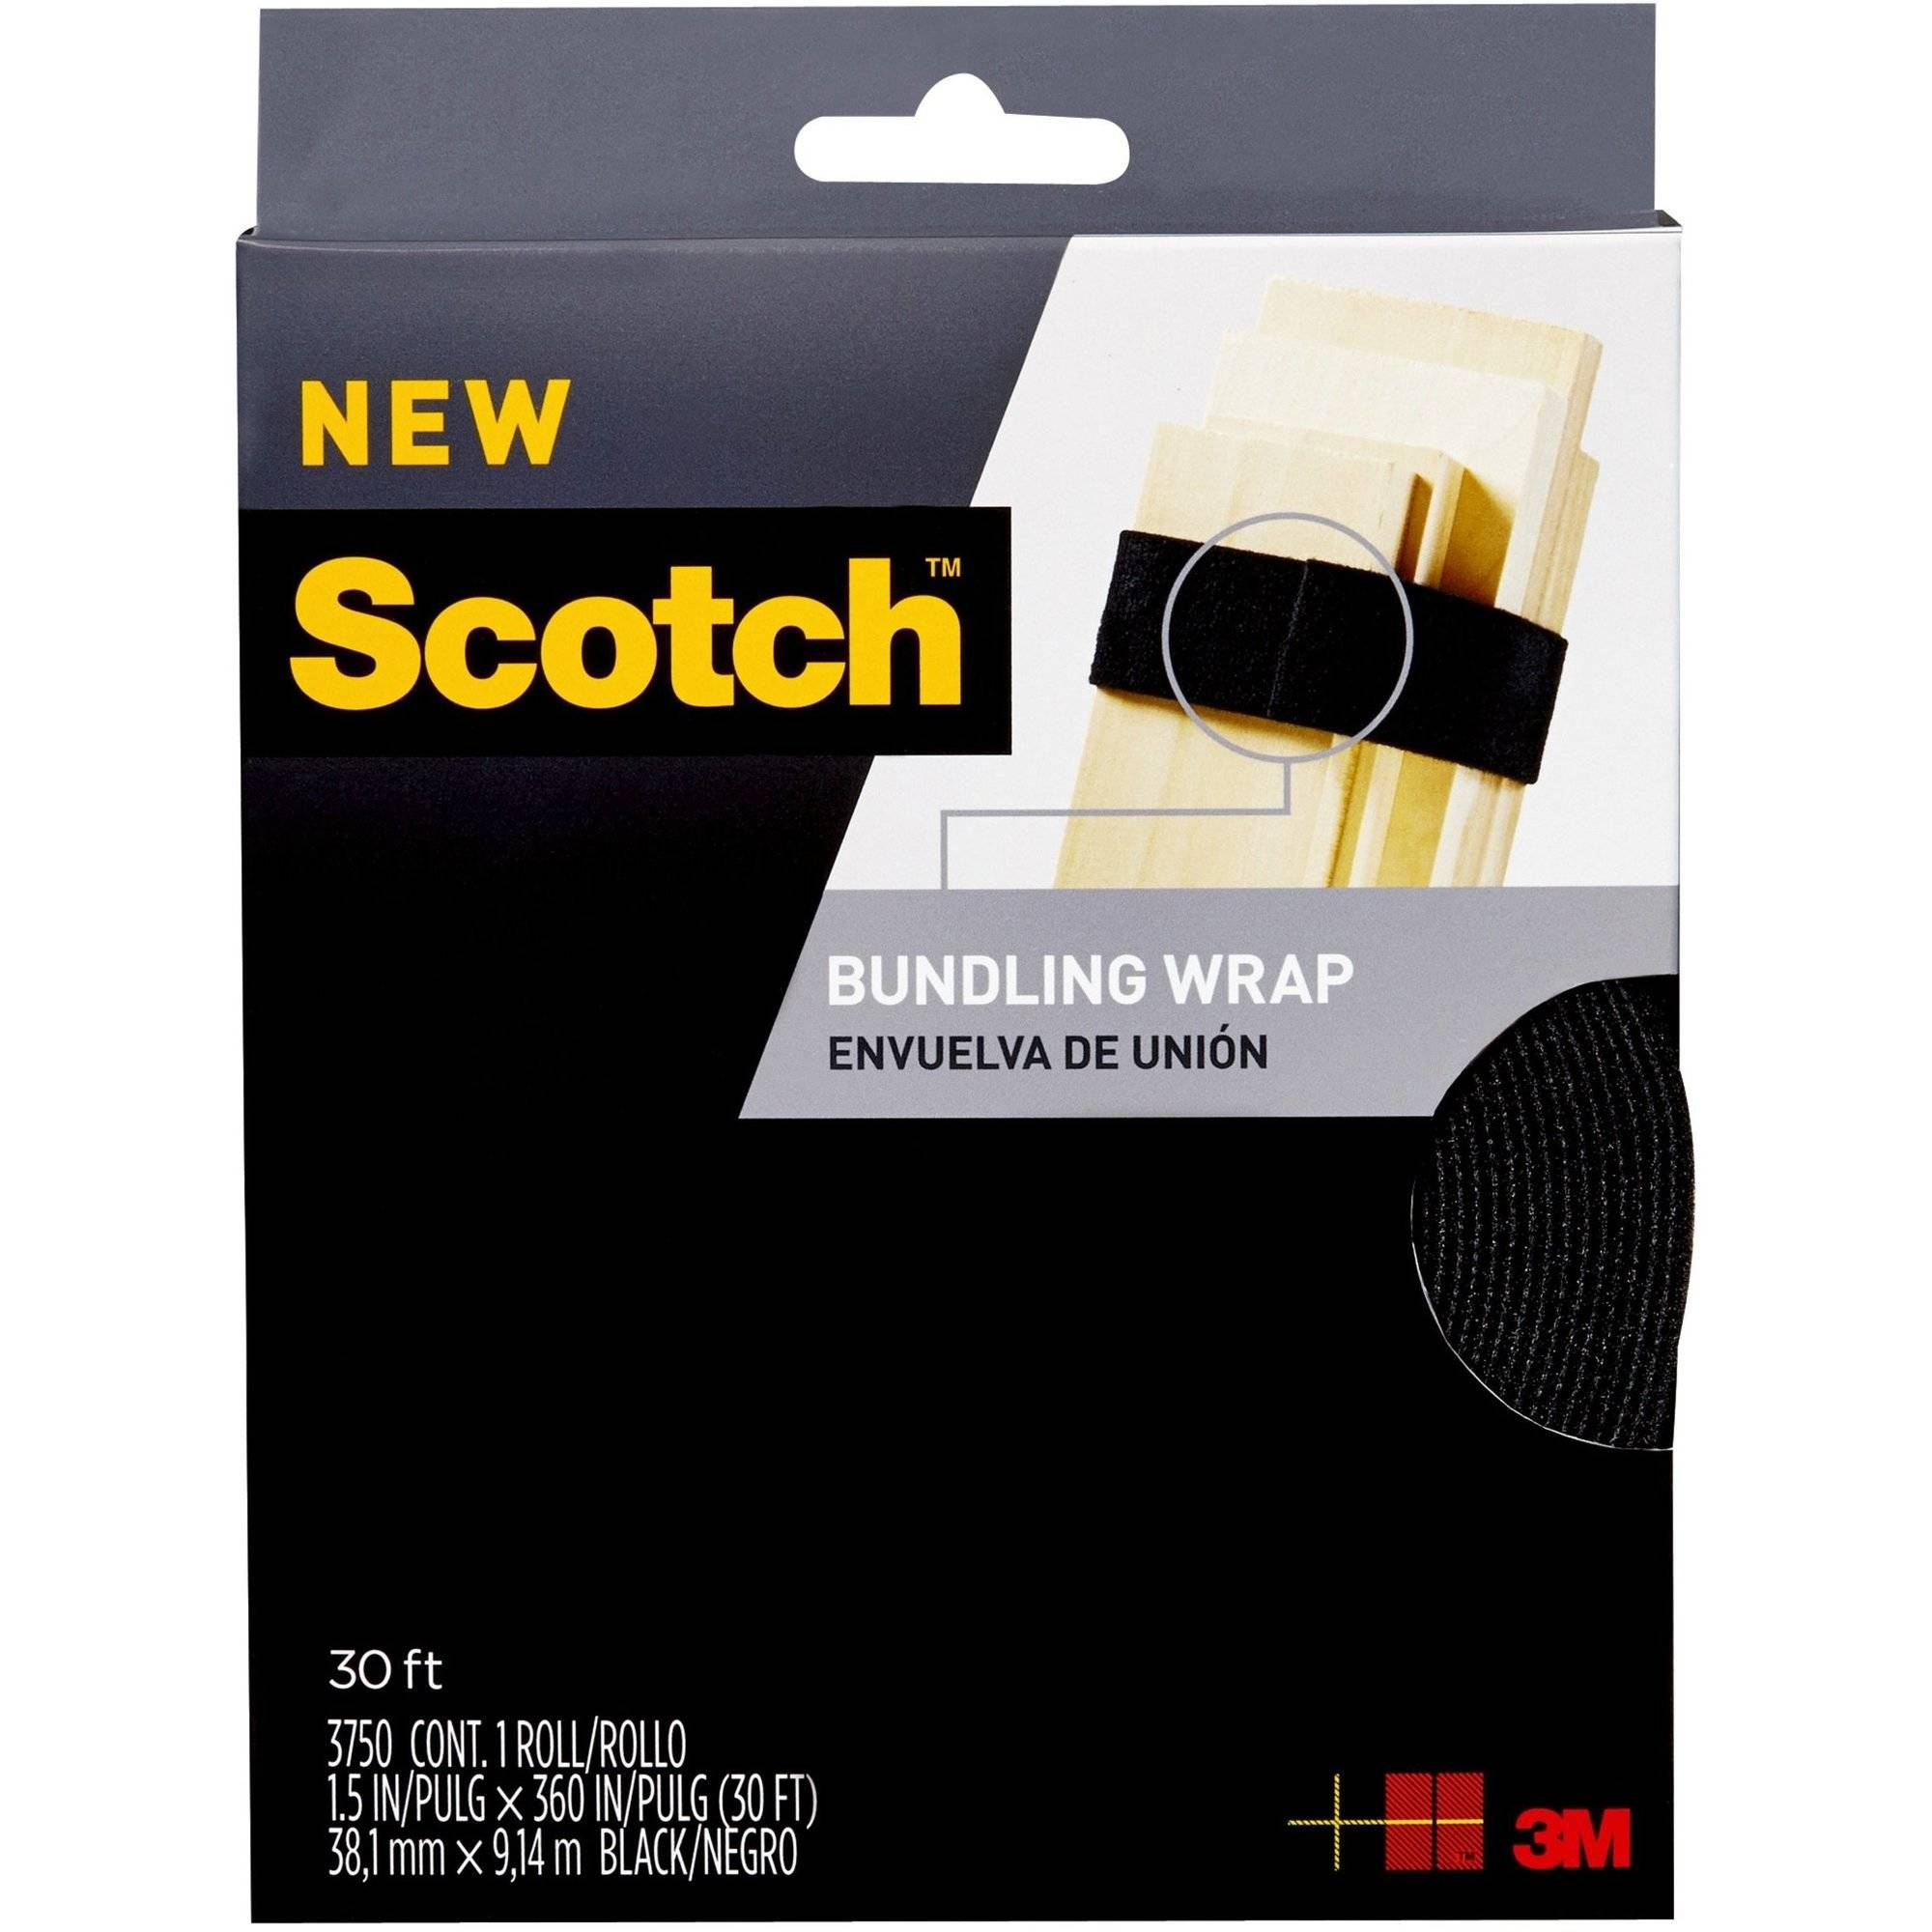 Scotch Bundling Wrap, 1.5 in. x 30 ft., Black, 1 Wrap/Pack